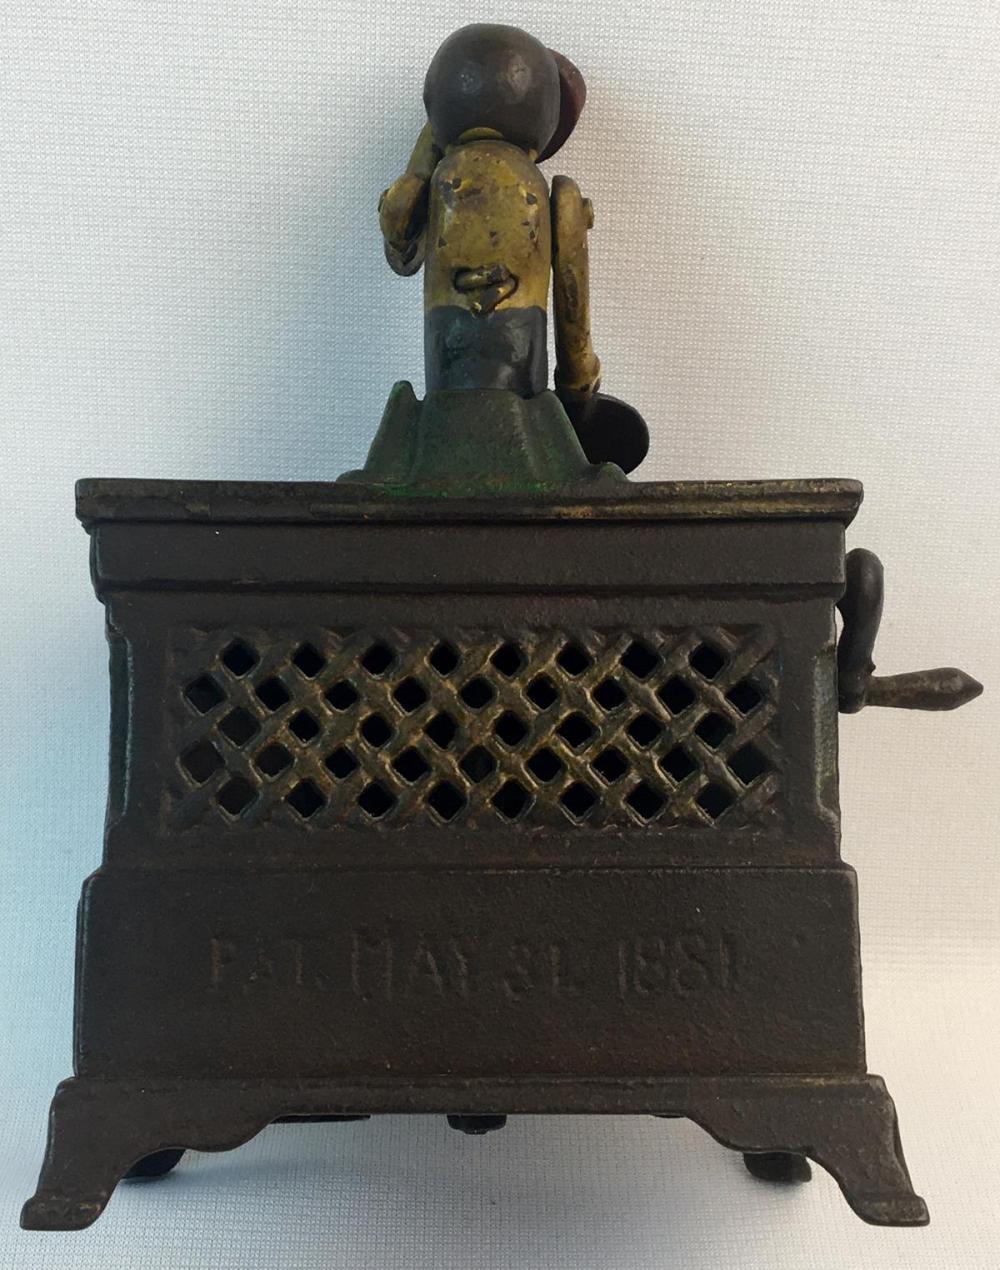 Antique 1881 Kyser & Rex Co. Hand Painted Cast Iron Mechanical